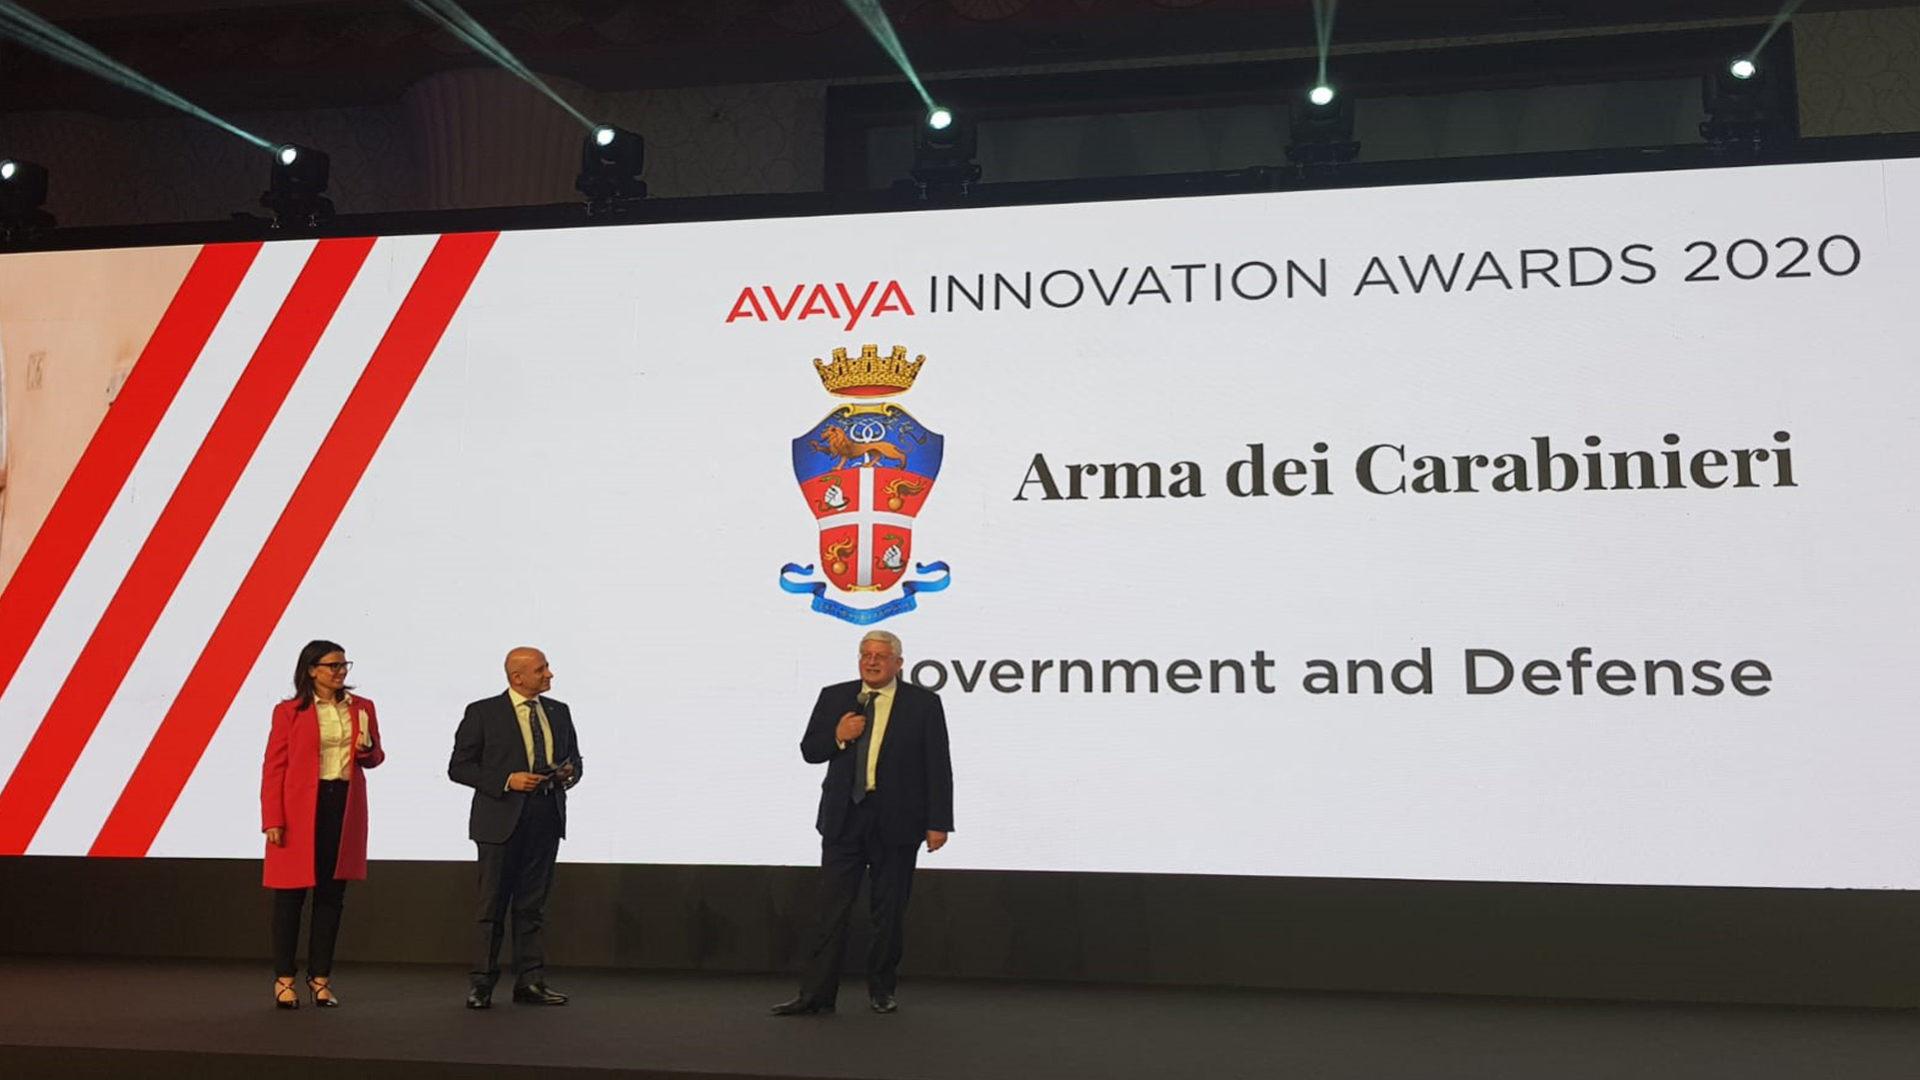 foto Avaya 2019 Arma Carabinieri